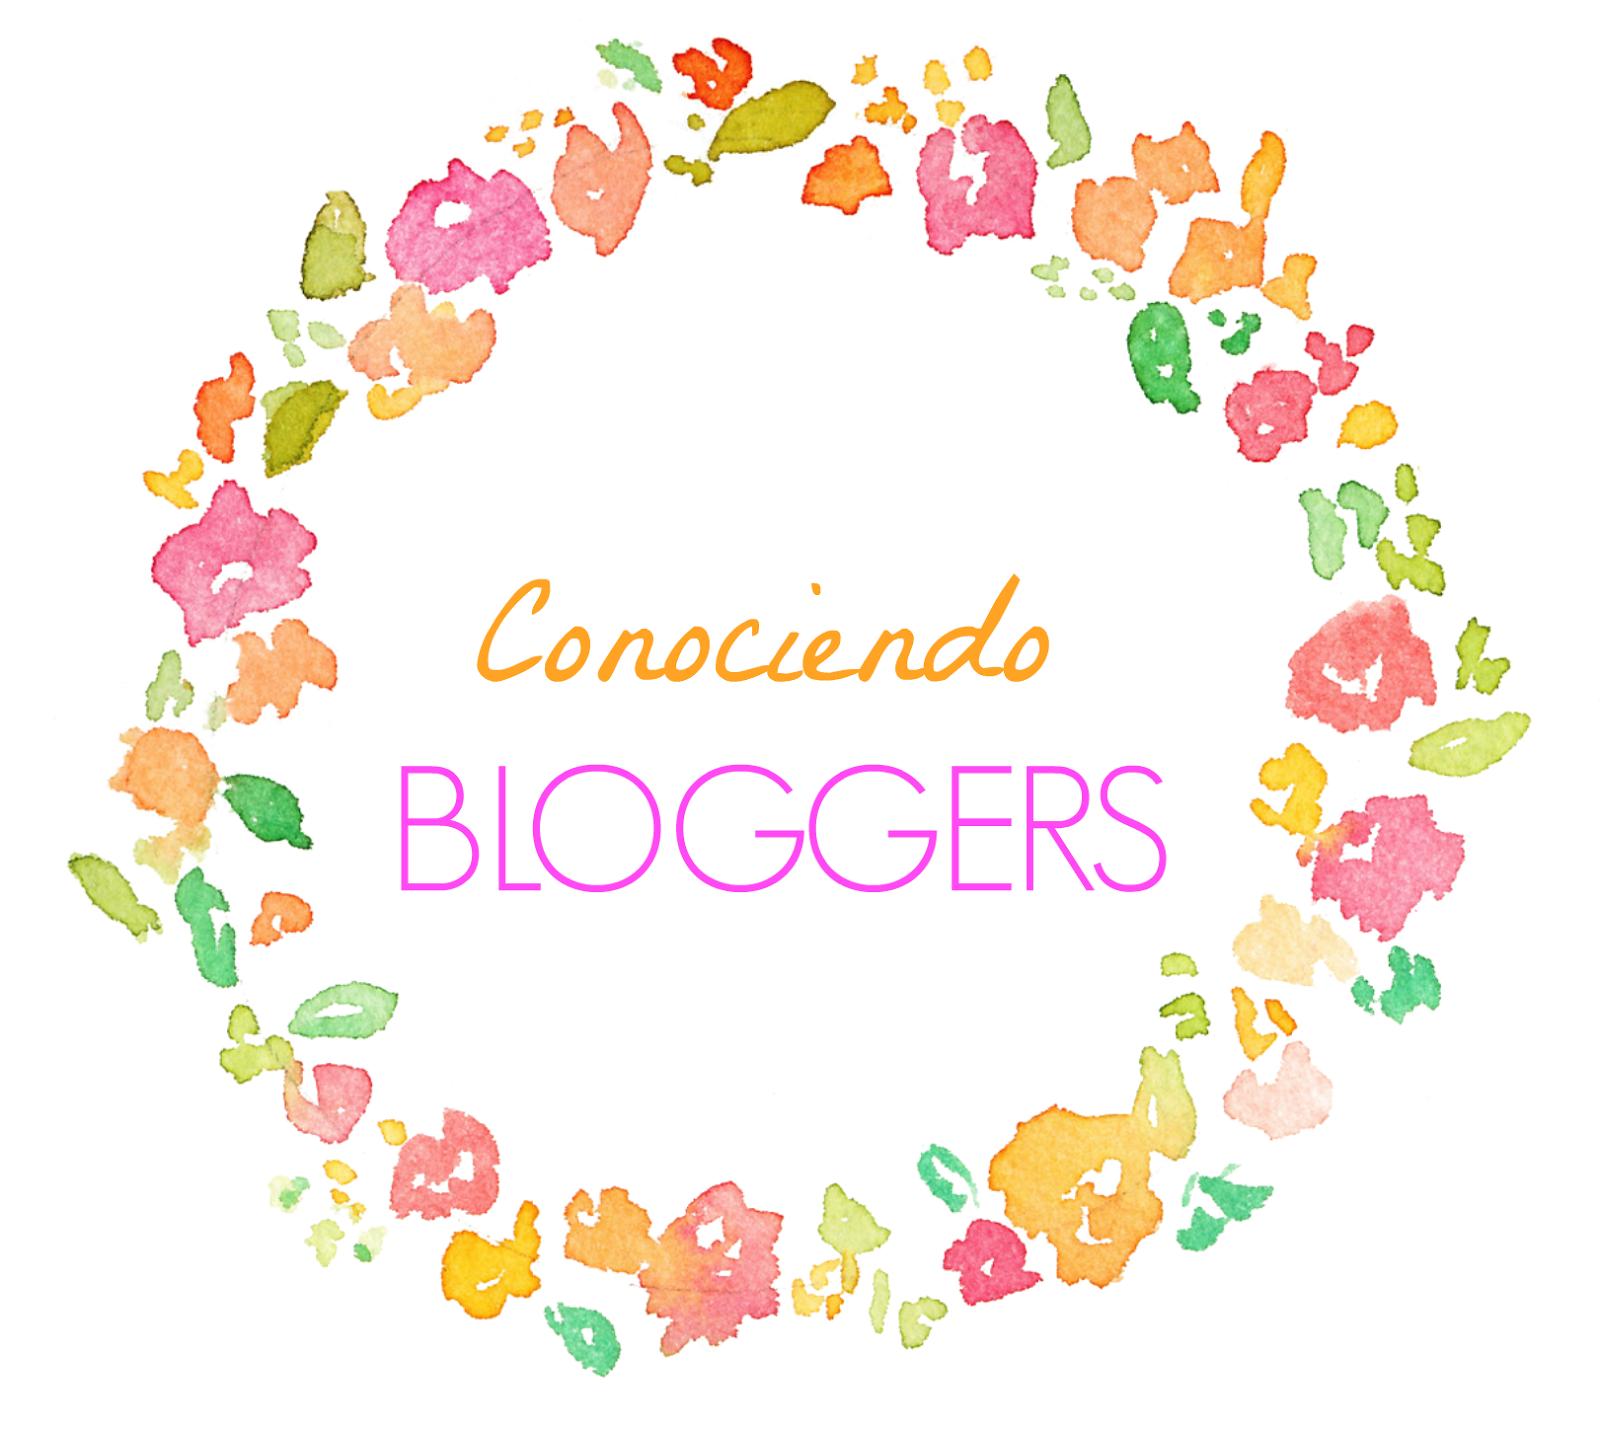 http://los-pequenos-detalles.blogspot.com.es/2015/01/iniciativa-conociendo-bloggers.html